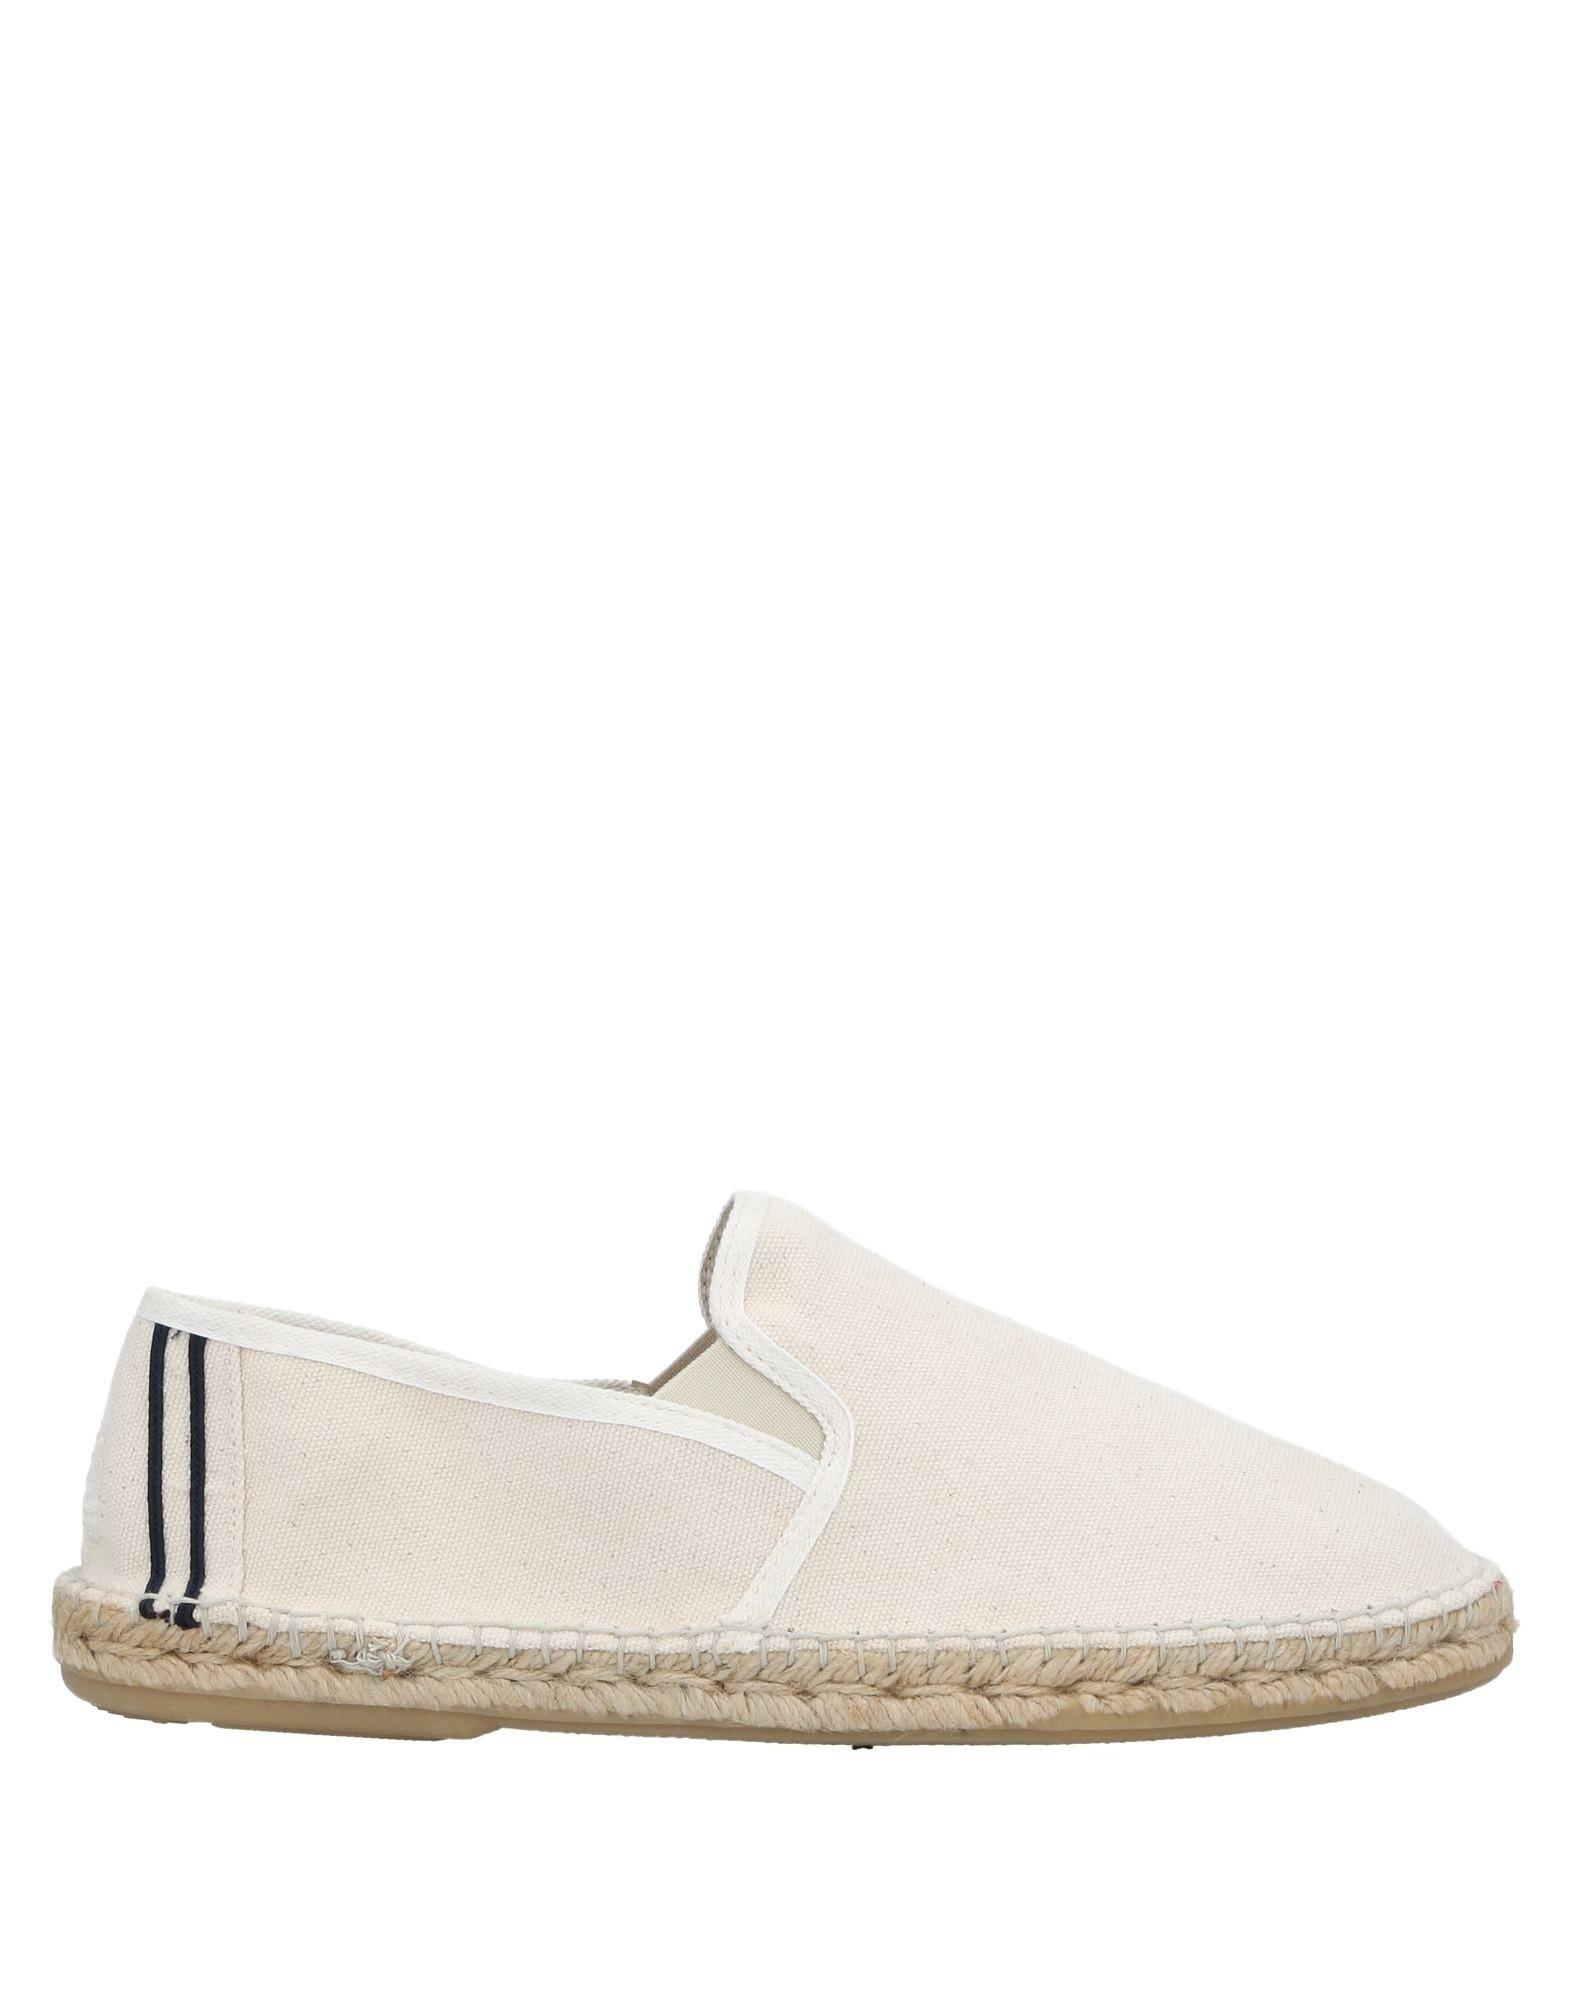 Rabatt echte Schuhe Marina Yachting Espadrilles Herren  11533140KX